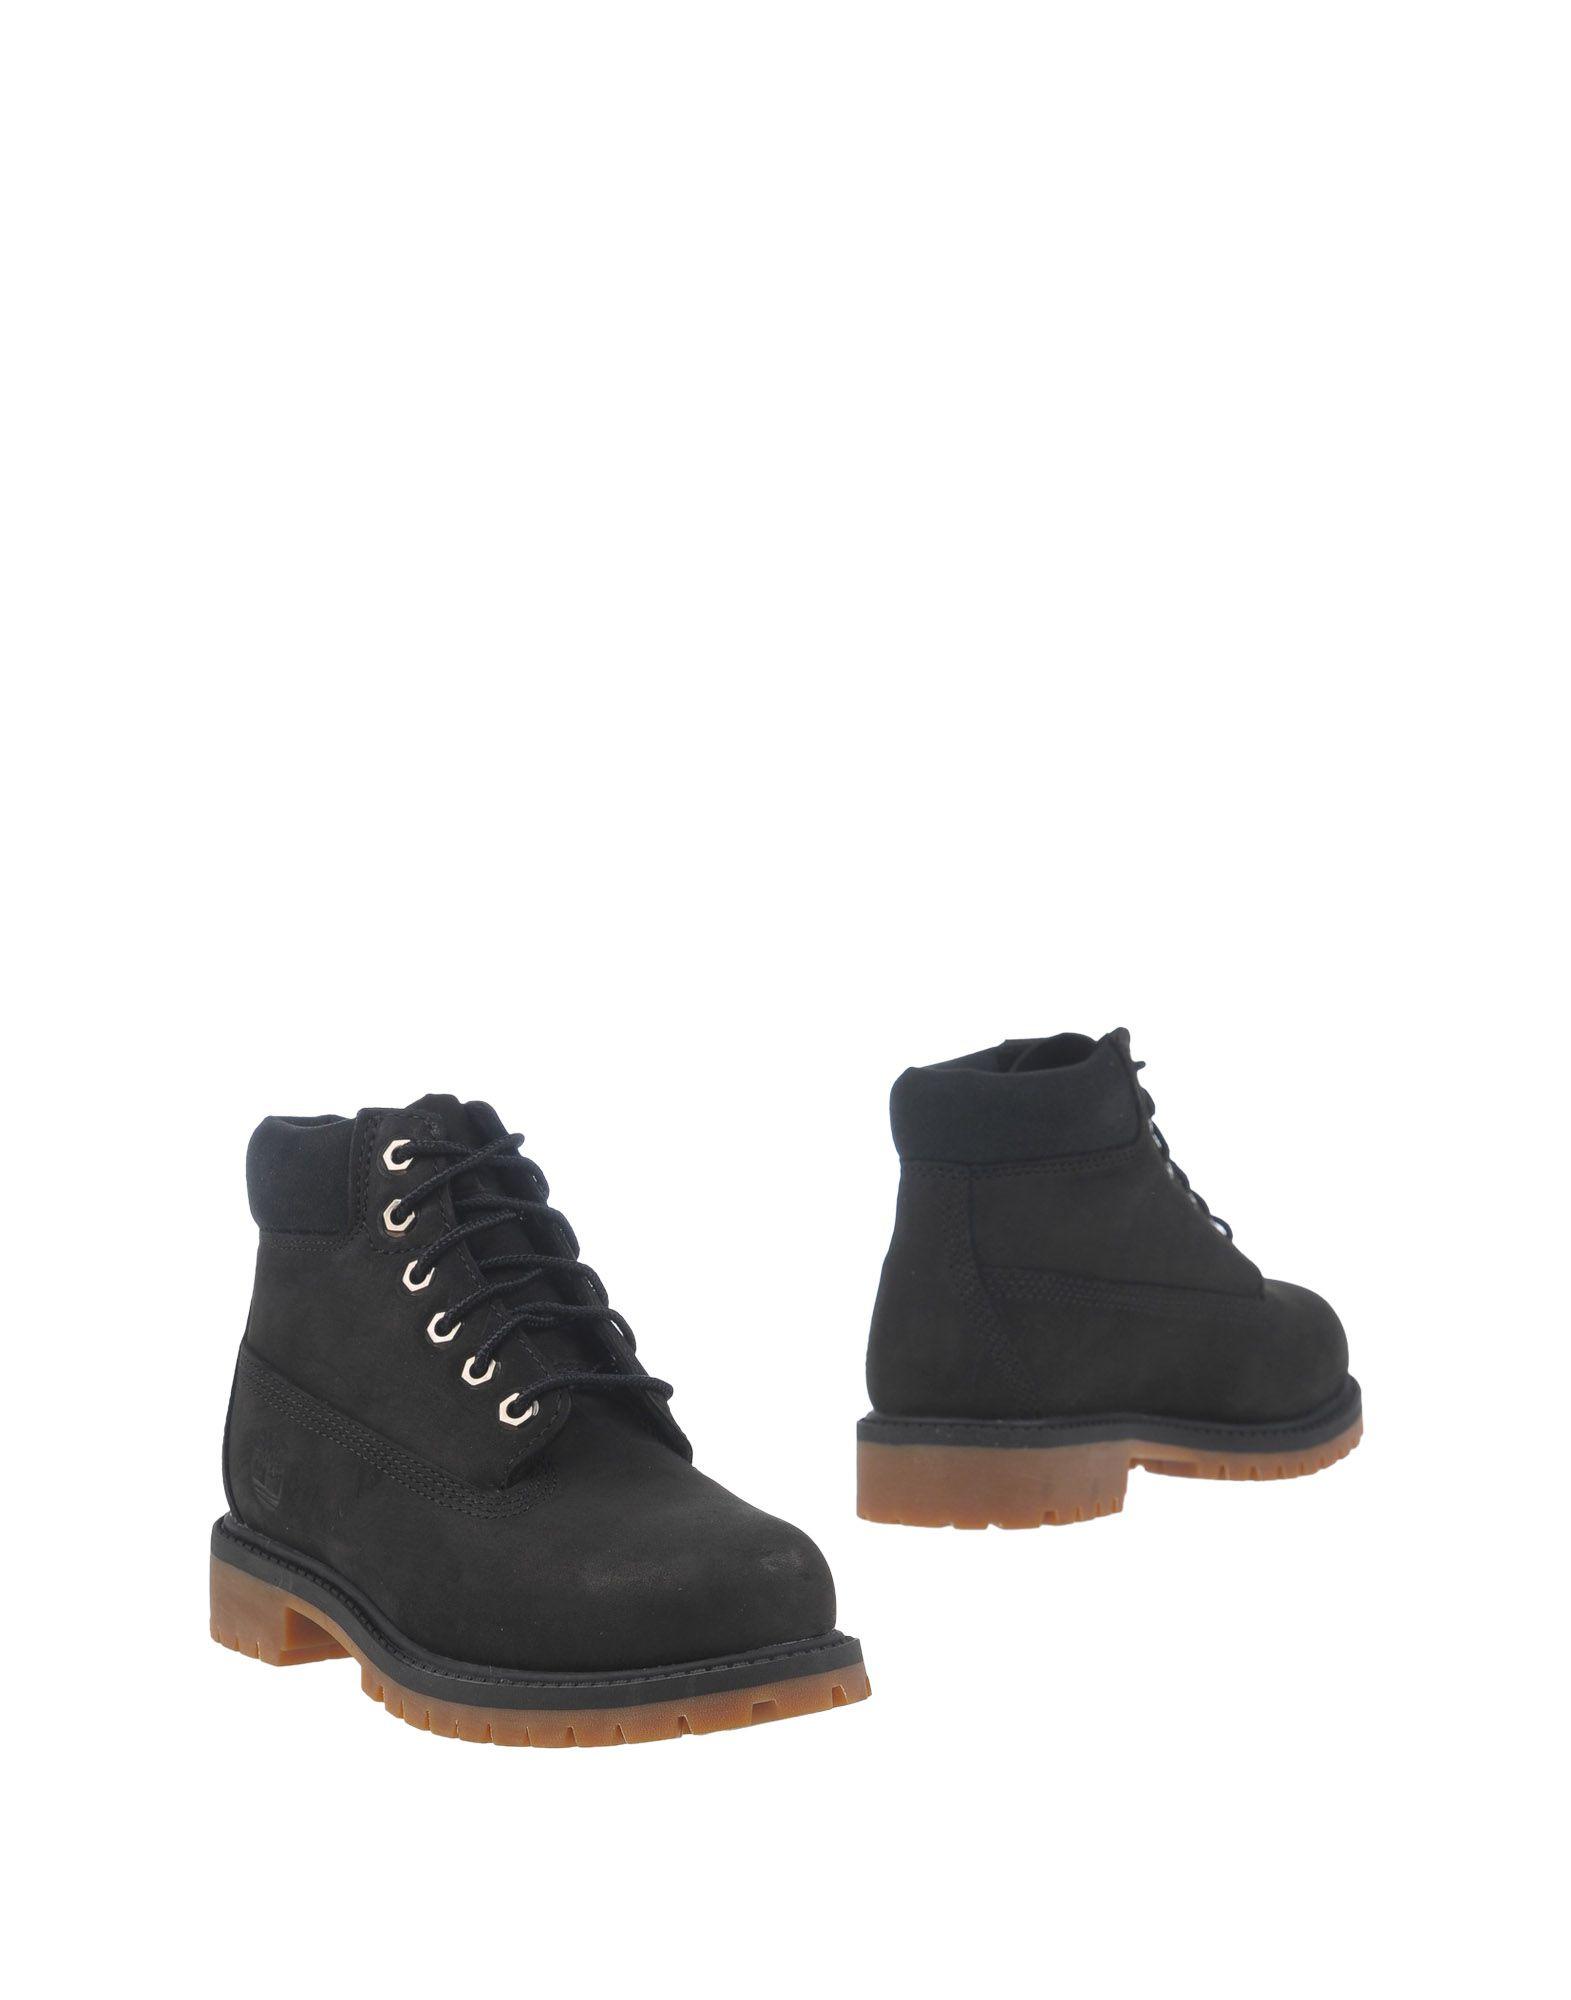 TIMBERLAND Полусапоги и высокие ботинки george j love полусапоги и высокие ботинки